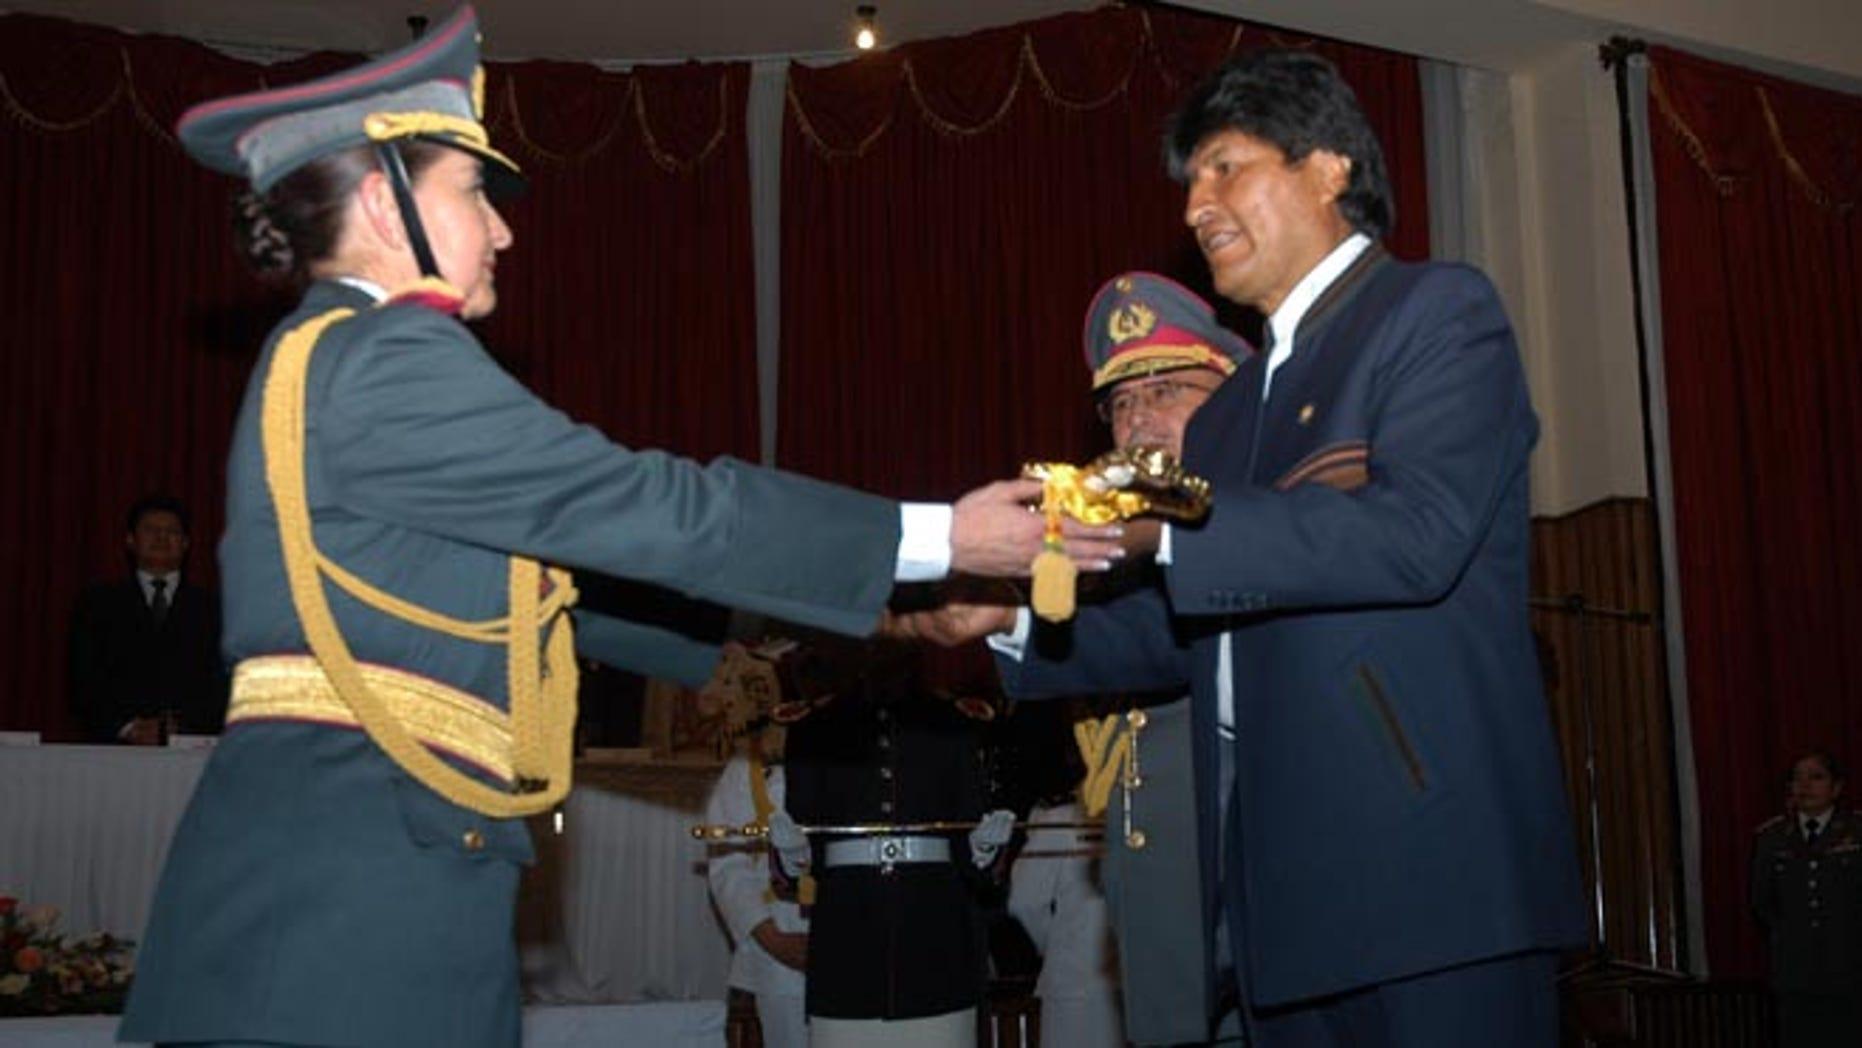 Bolivian Gen. Gina Reque Terán (L) with Bolivian President Evo Morales (R).